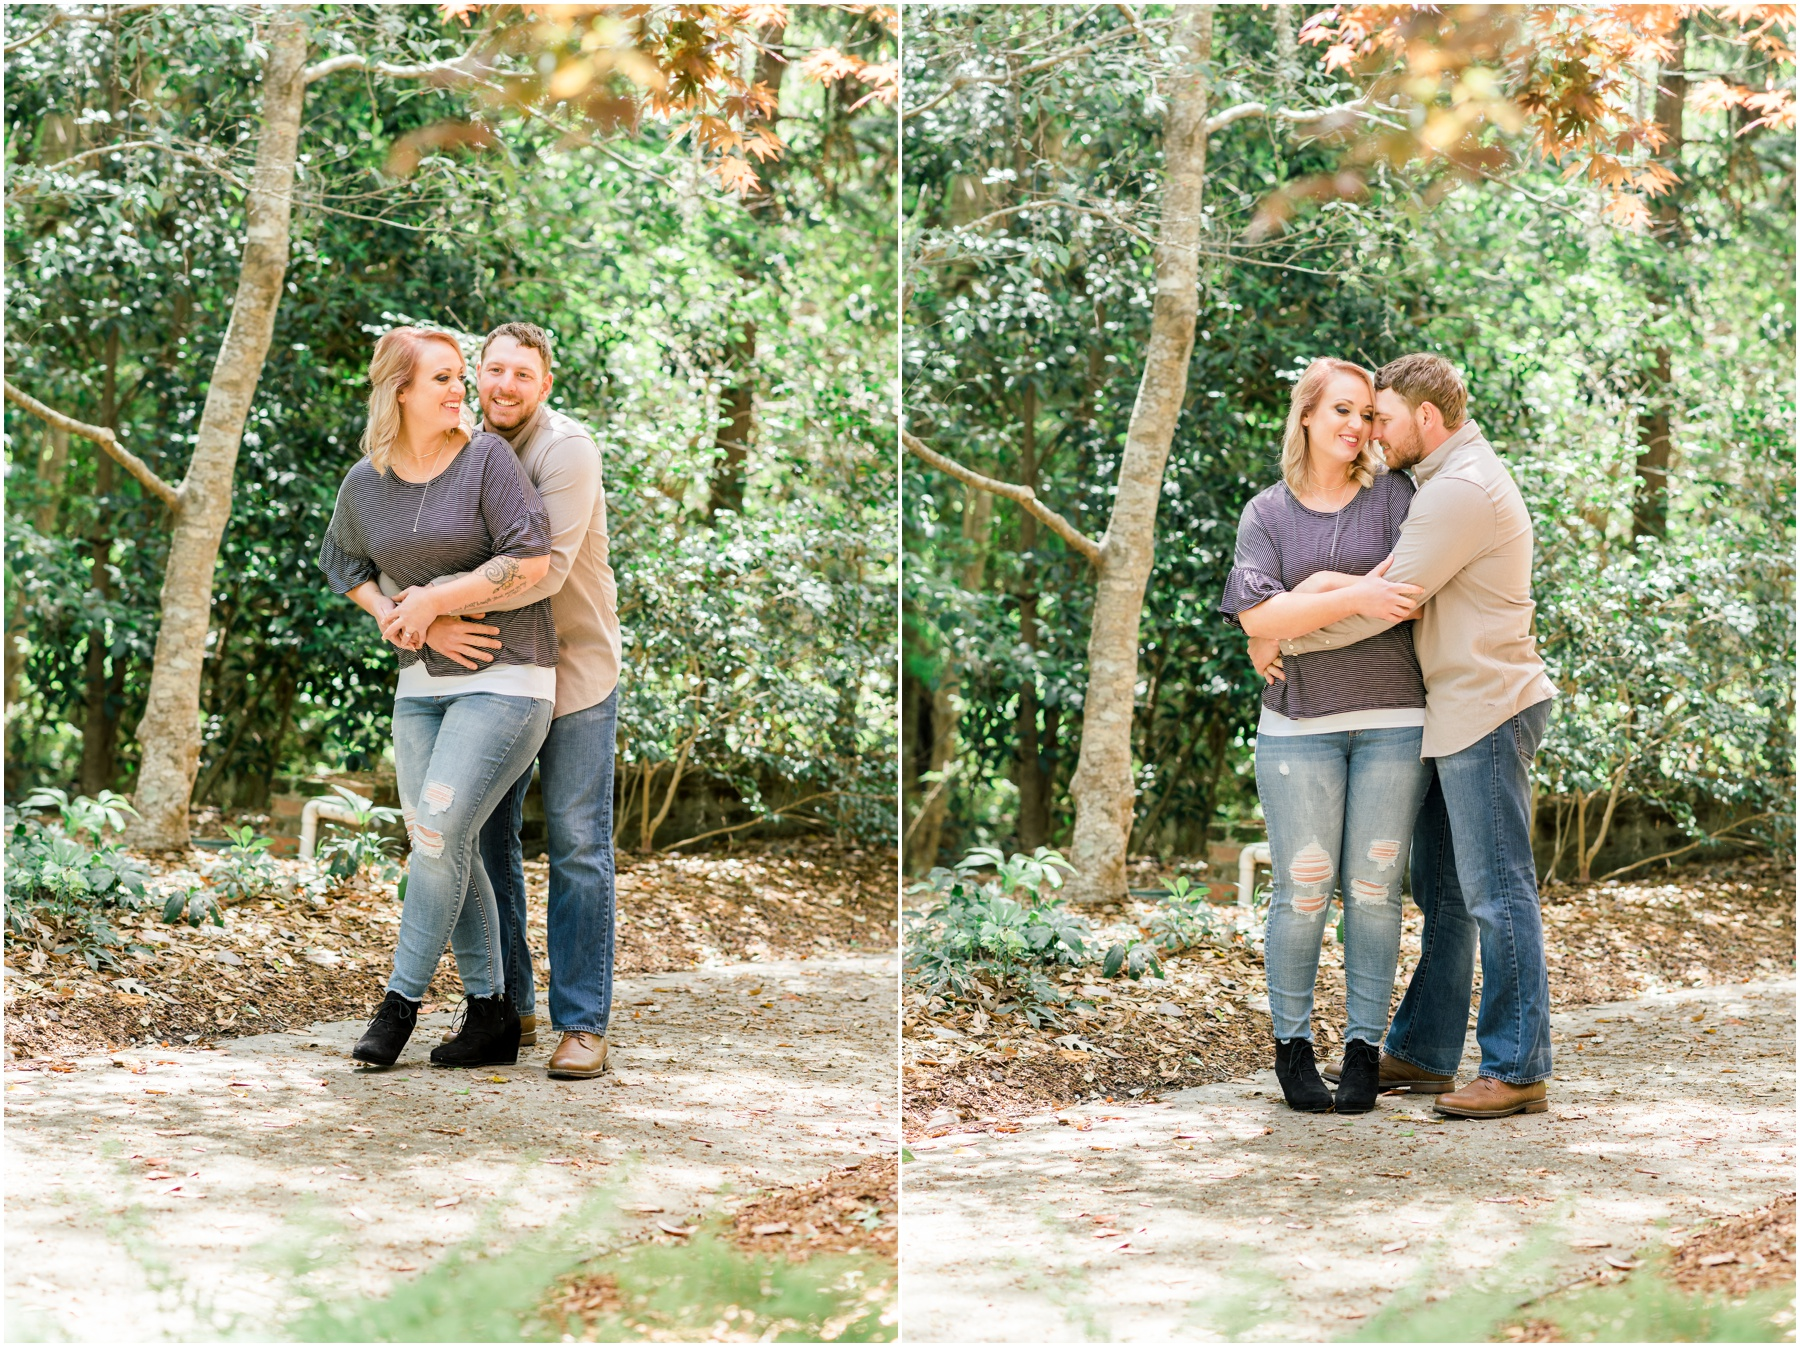 Mepkin-Abbey-Moncks-Corner-South-Carolina-Engagement-Session-Photos_0013.jpg